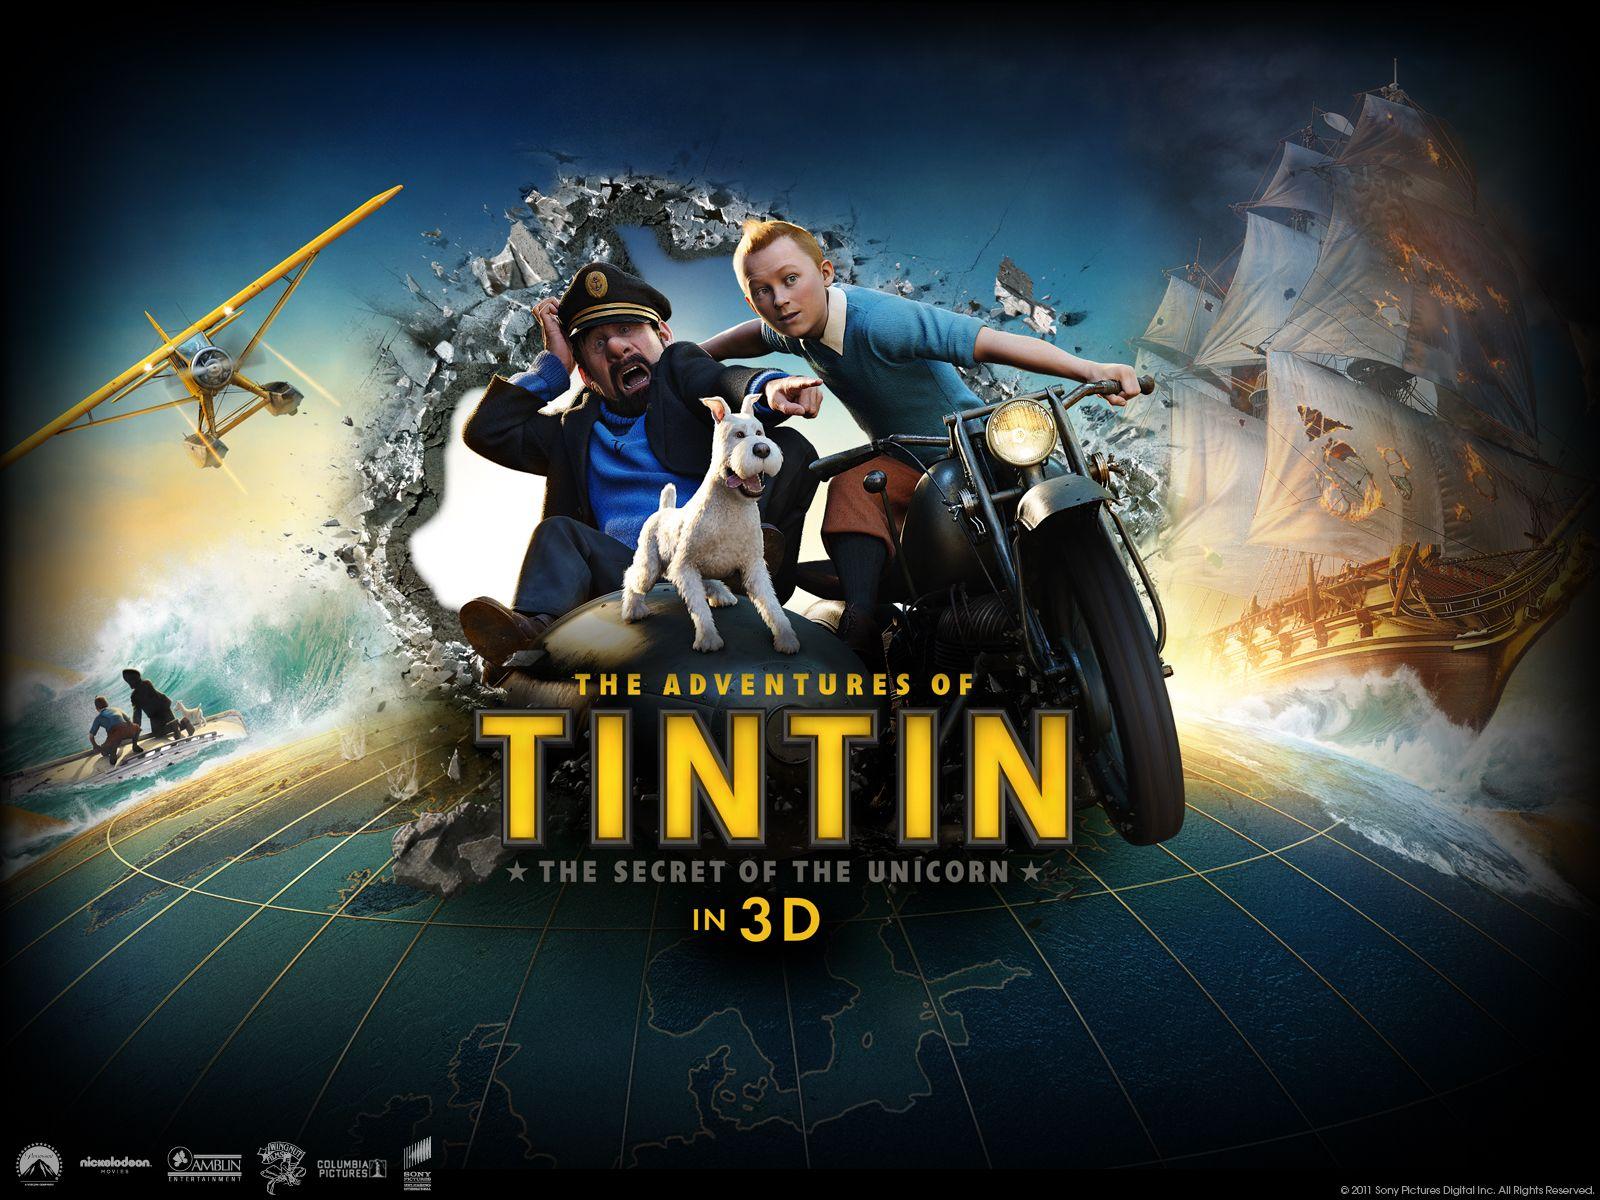 The Adventures of Tintin Filmi Yapım Aşaması